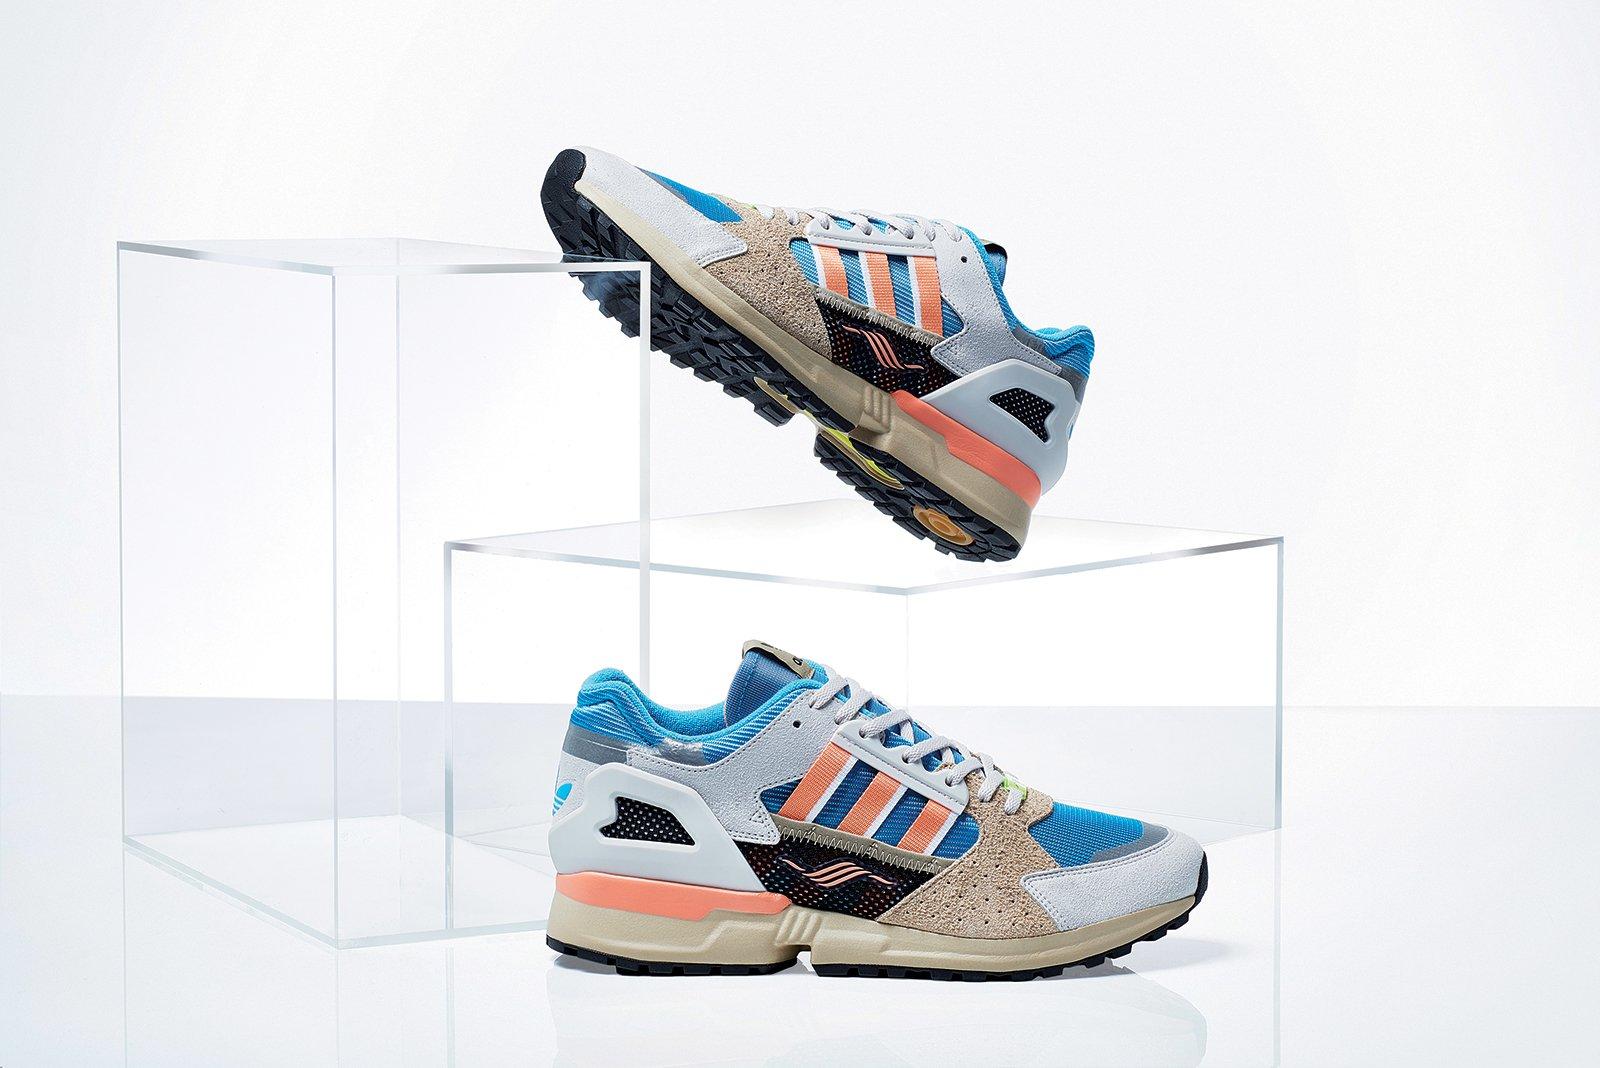 EE9485_adidas_Consortium_Torsion_ZX10000C_01_ddba3e88-54da-43b1-b751-82b154e1a10d.jpg